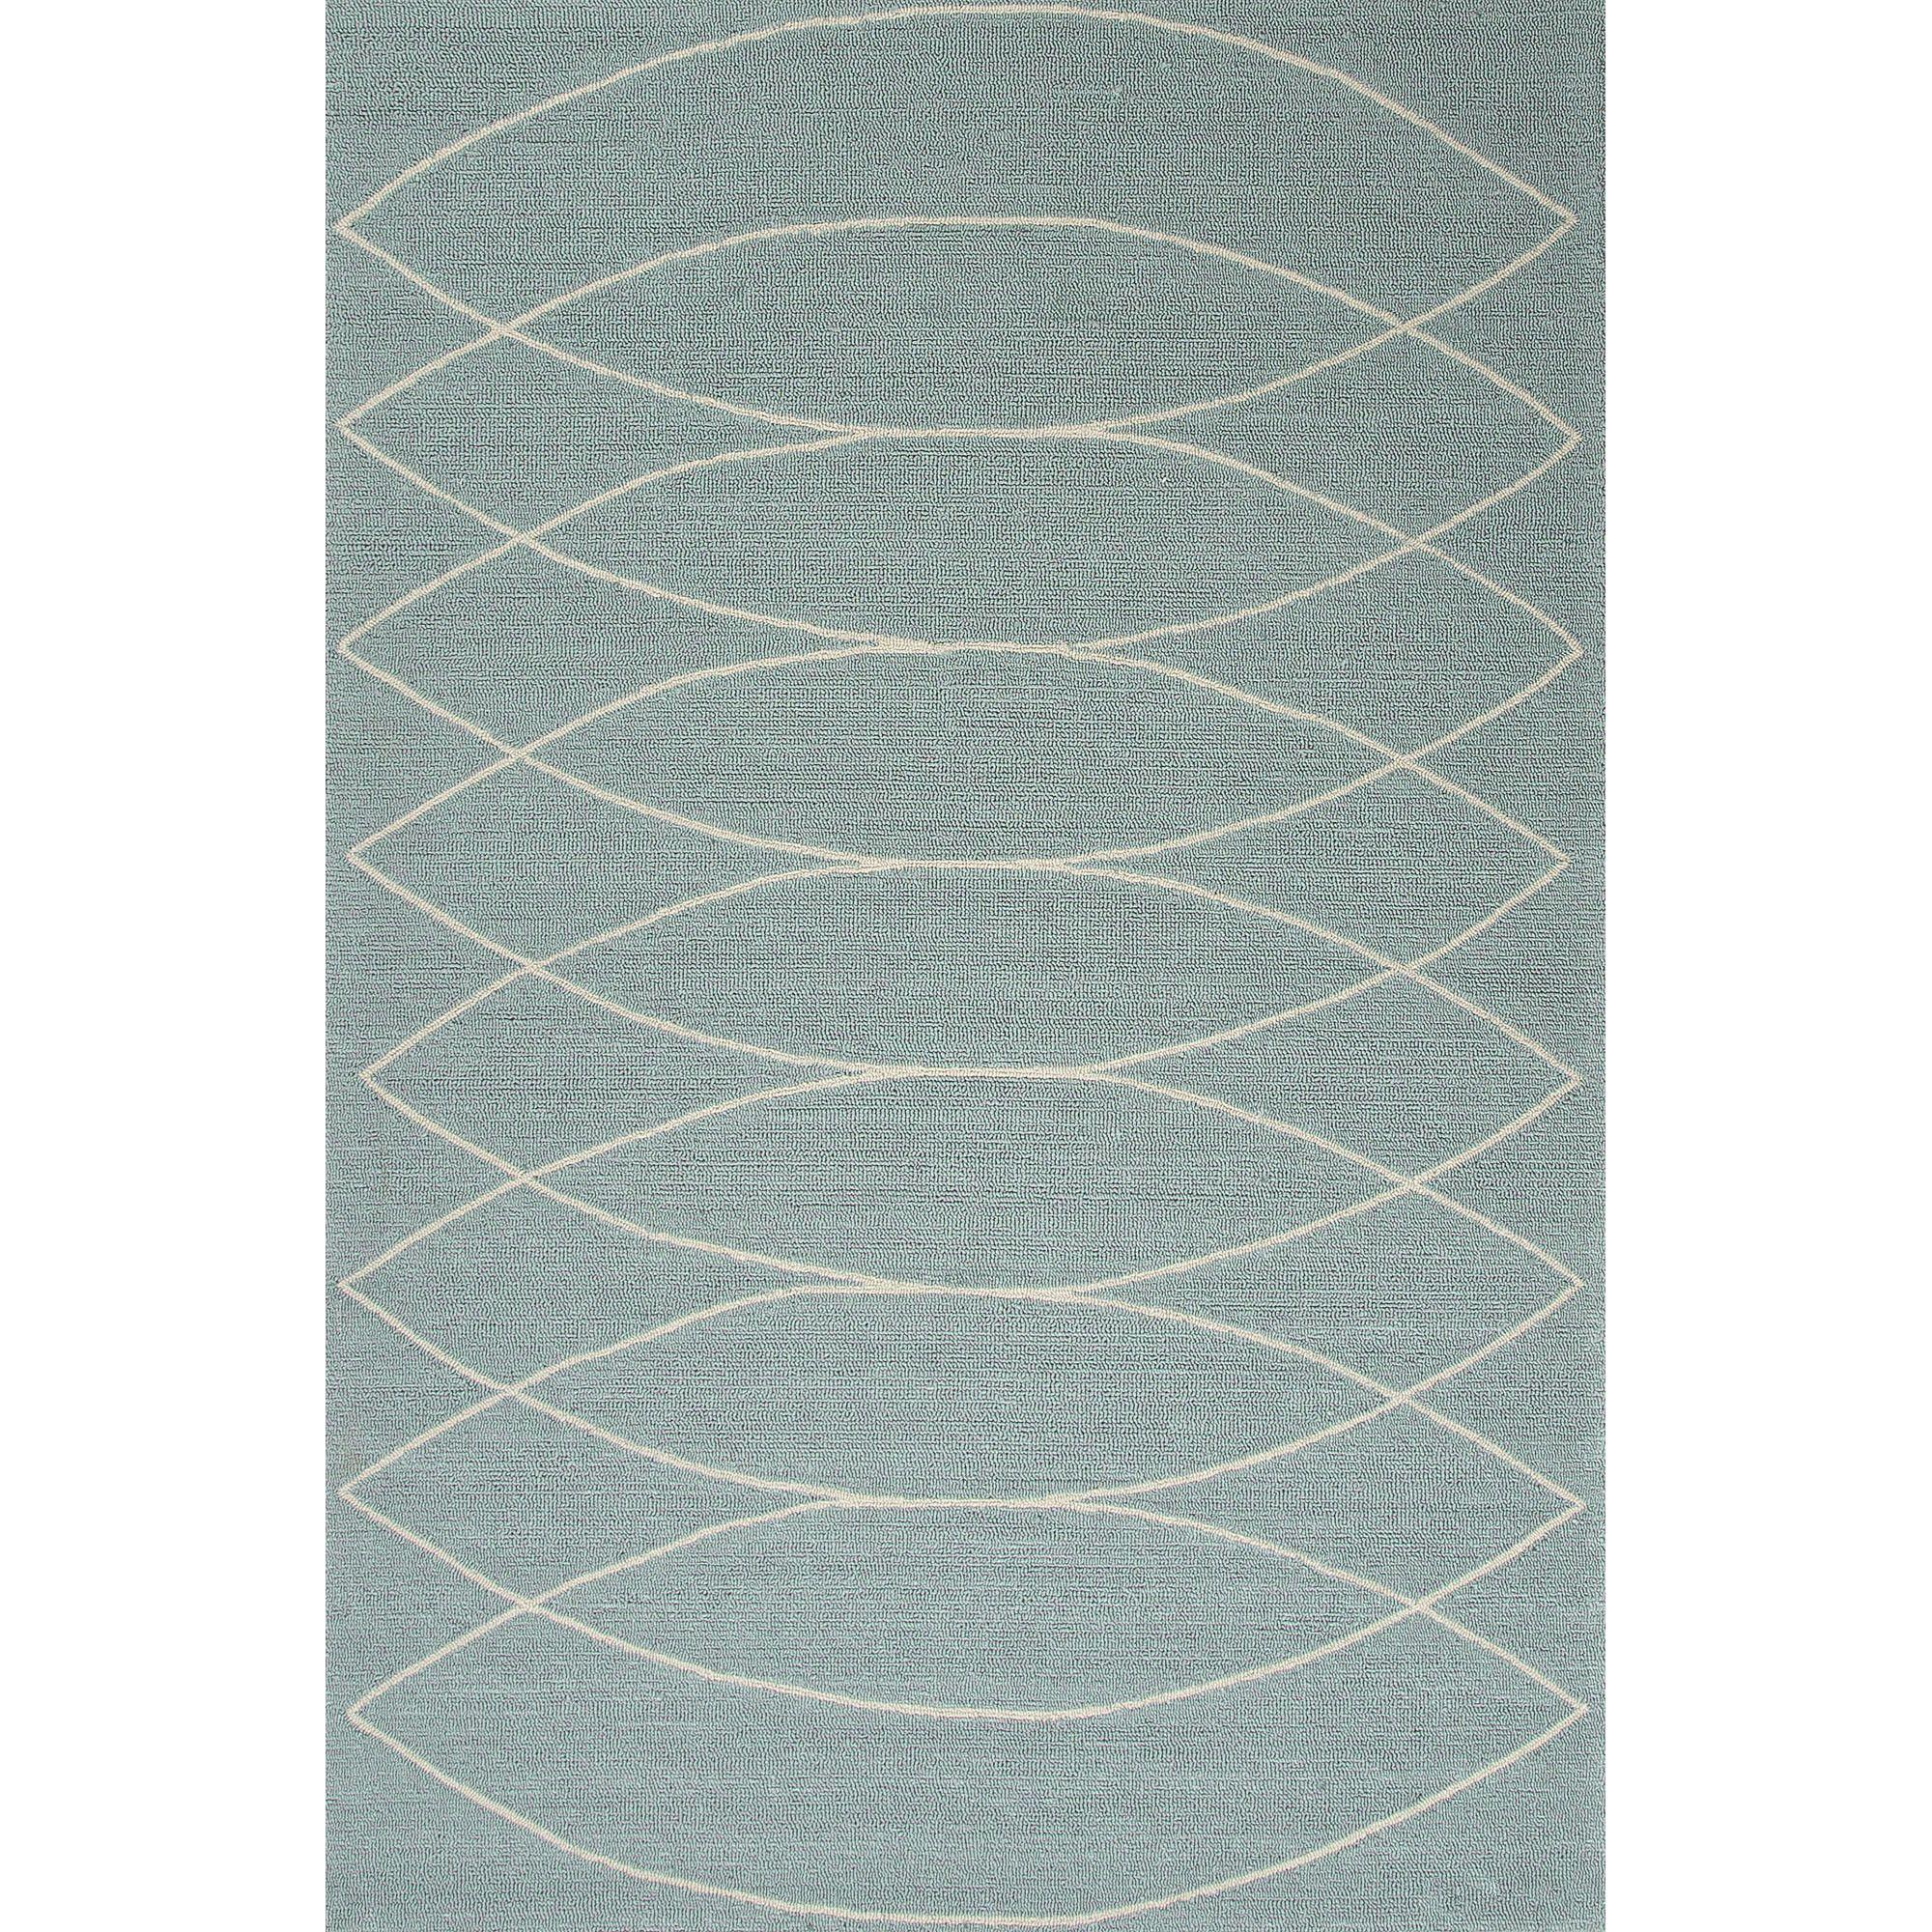 Jaipur Rugs IndoorOutdoor Geometric Pattern Blue/Ivory Polypropylene Area Rug GD24 (Rectangle)